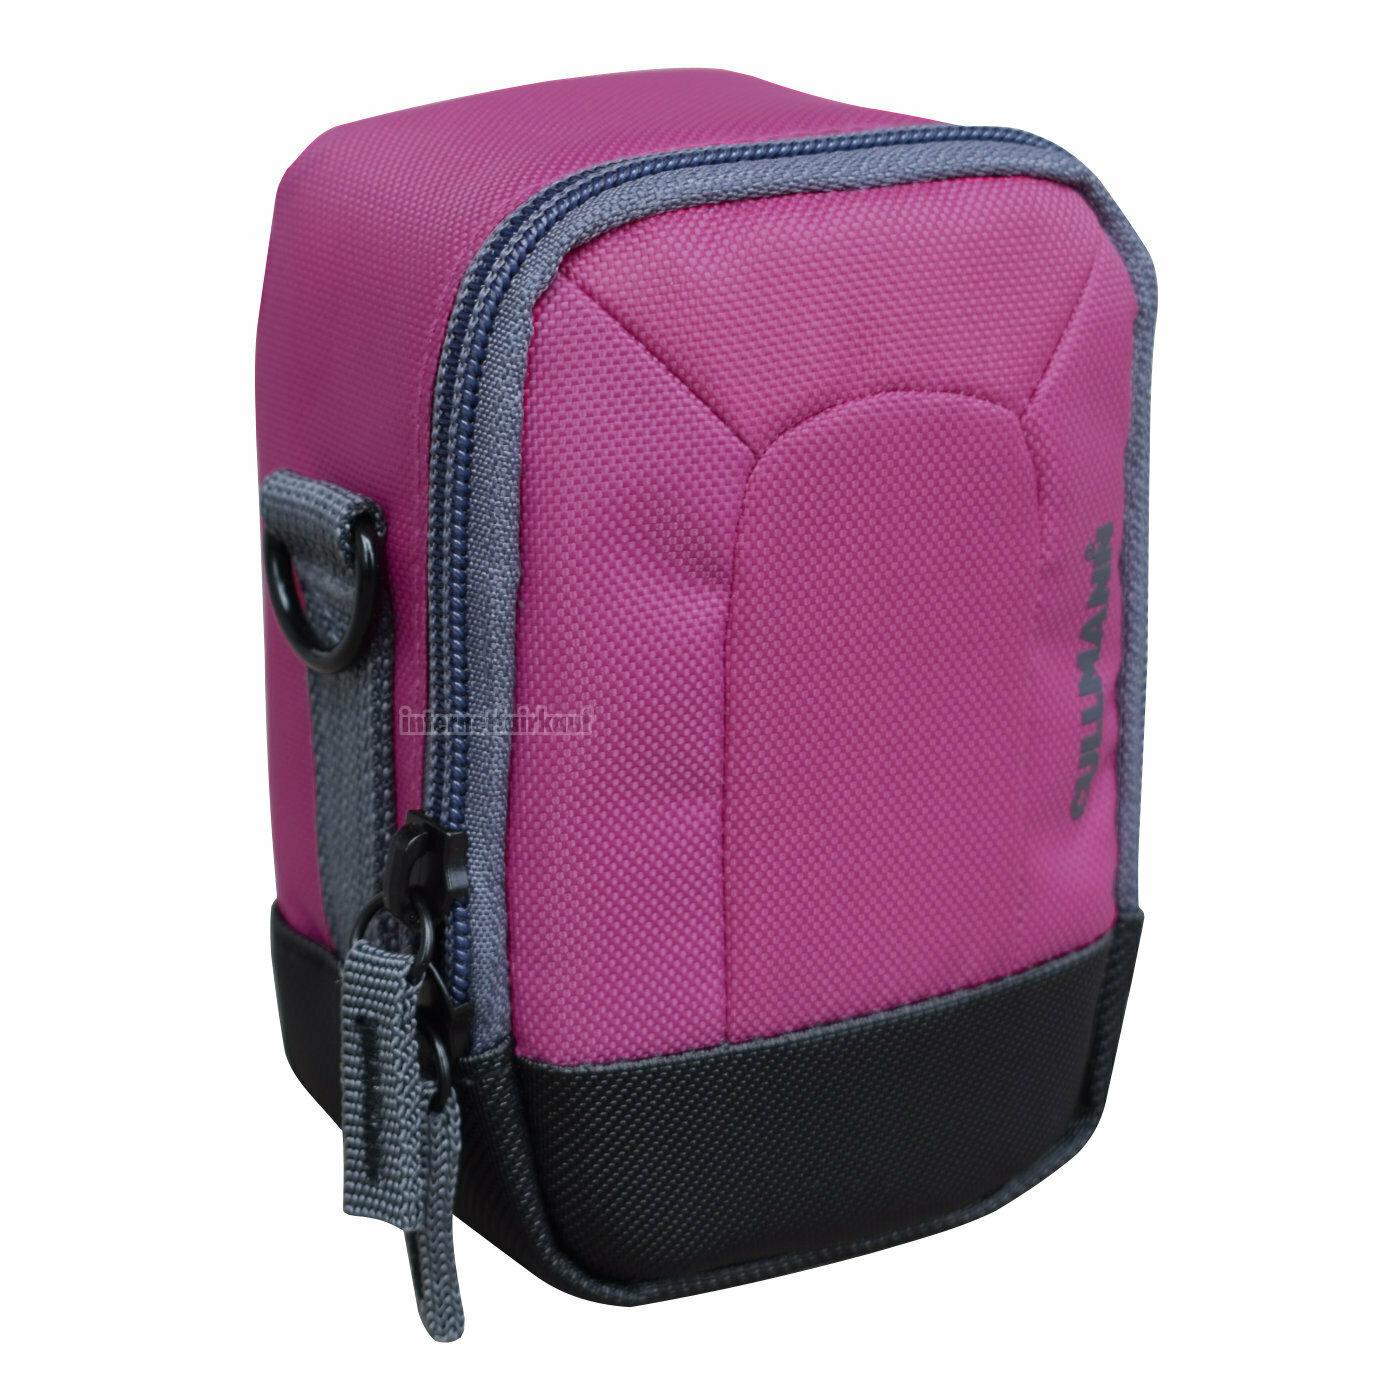 Kameratasche purple passend für Panasonic Lumix DMC-TZ81 DC-TZ91 DC-TZ96